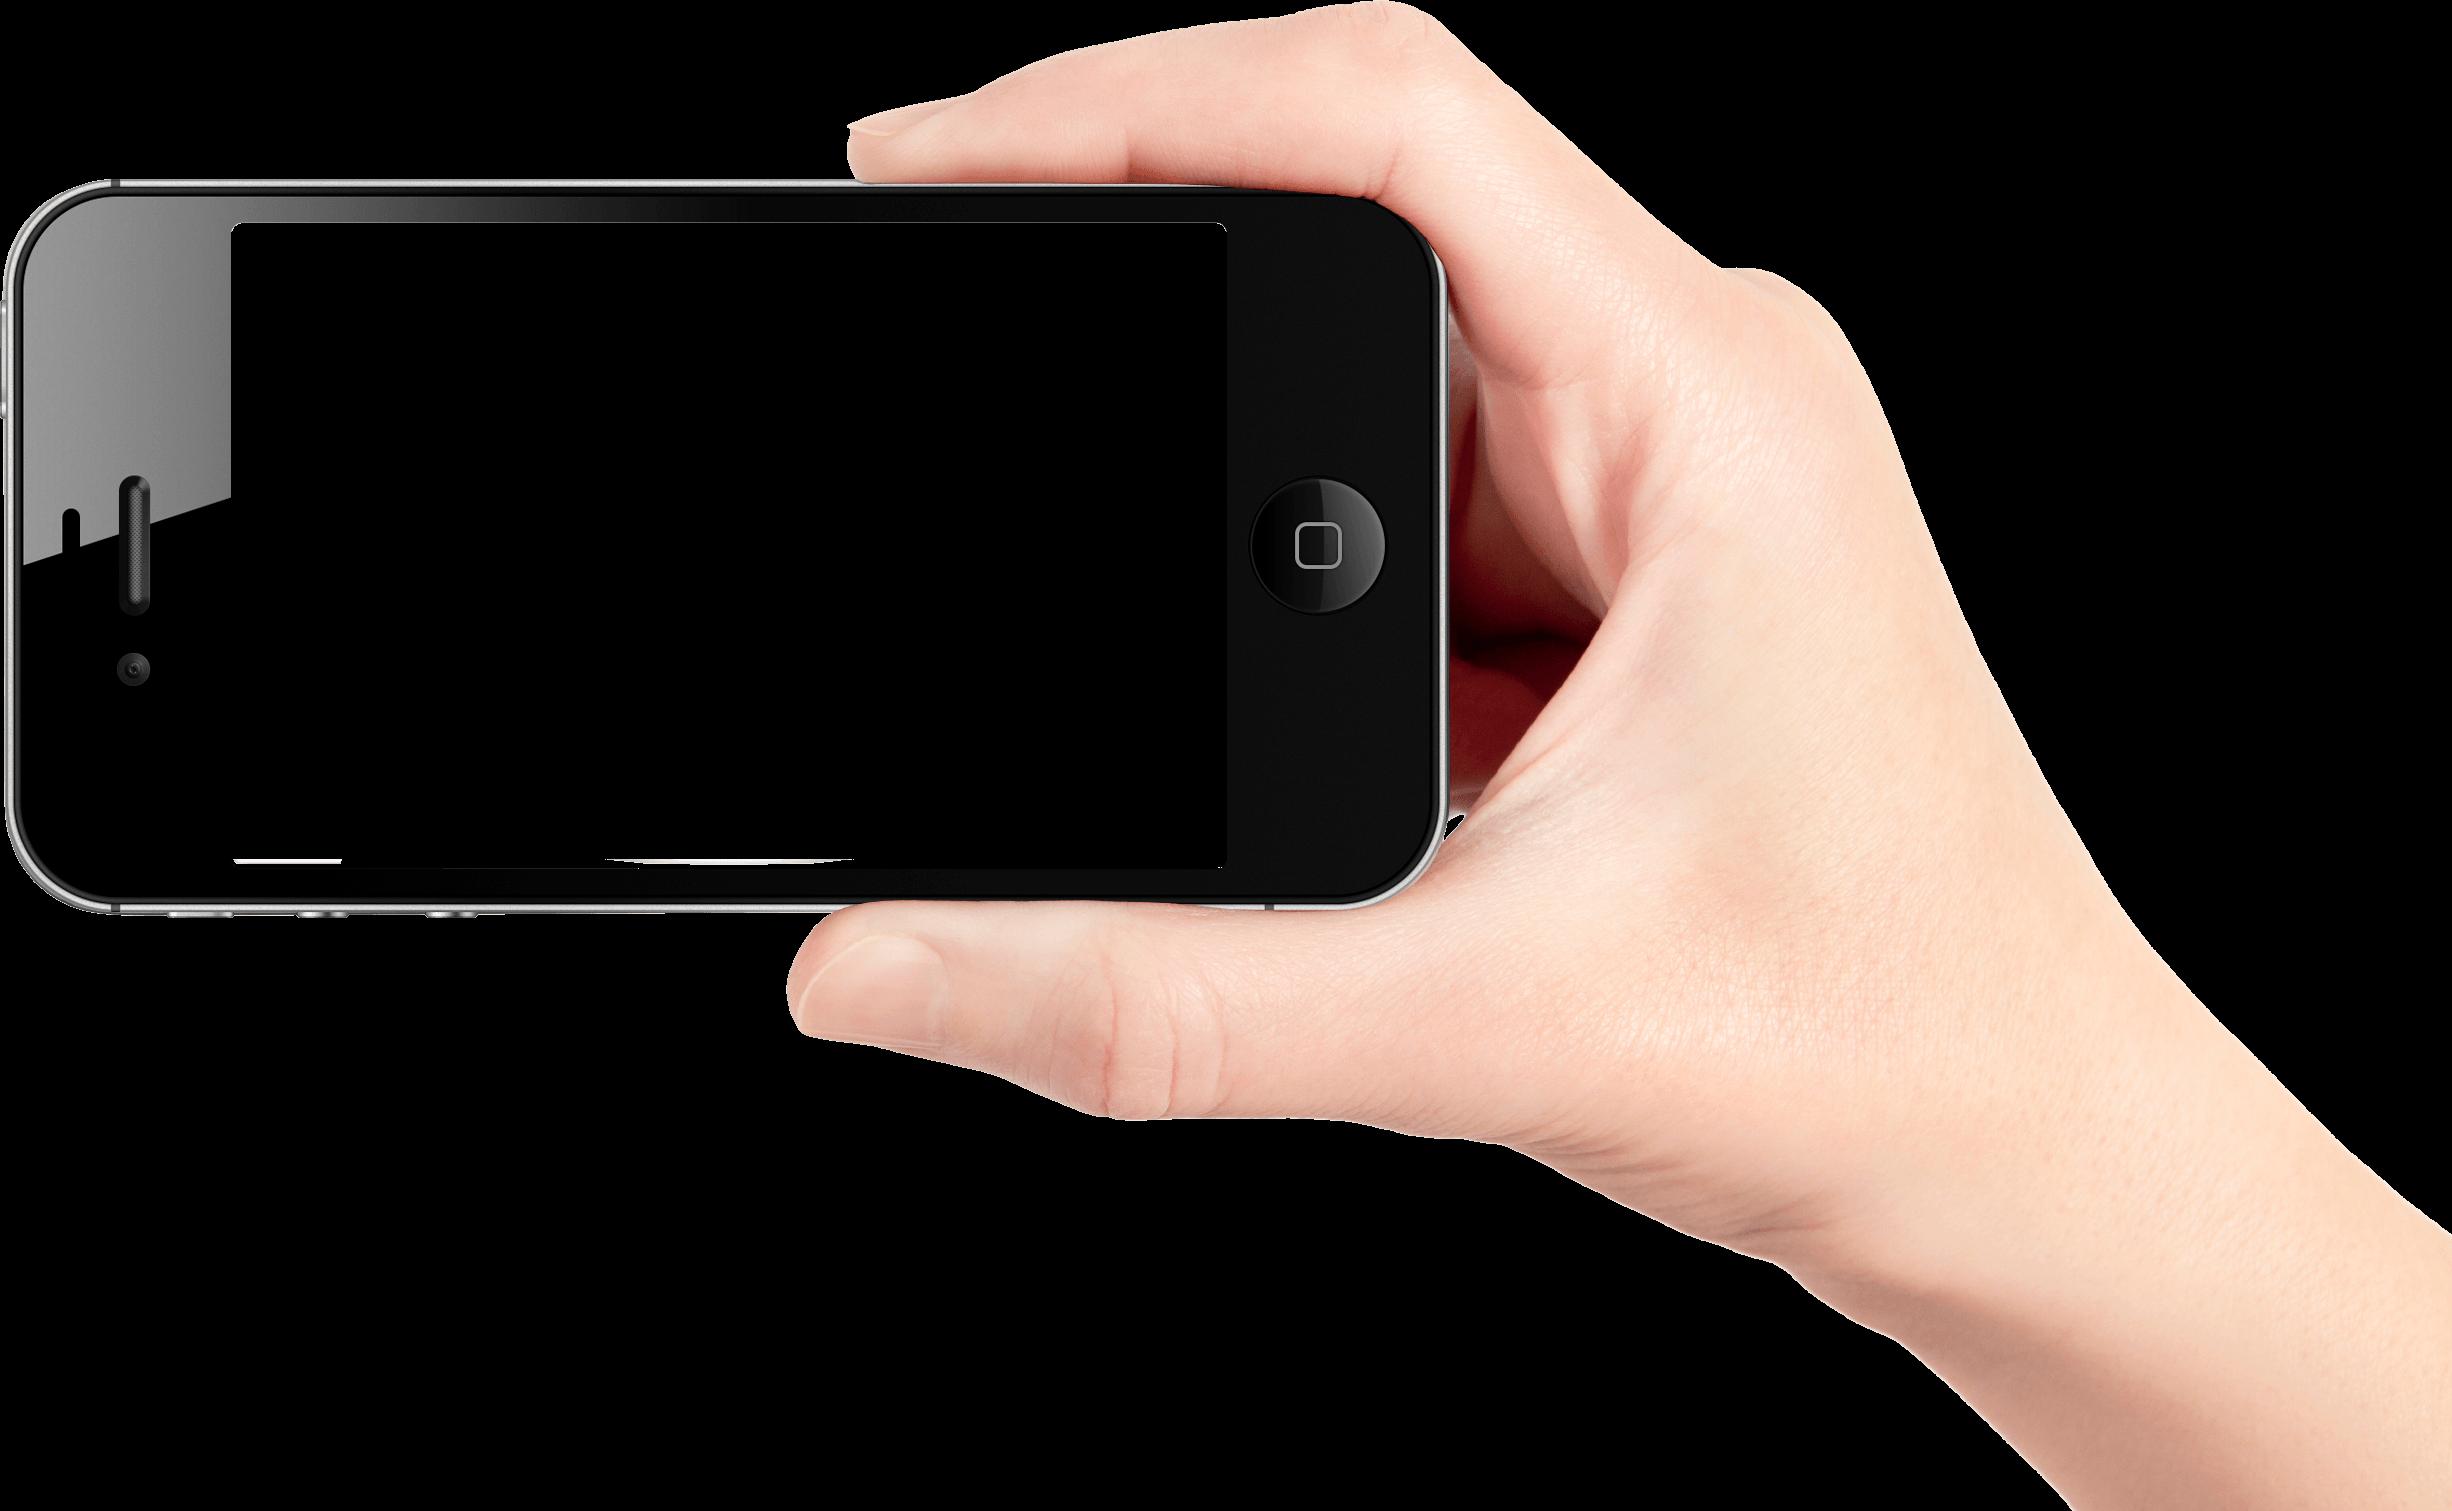 smartphone png transparent smartphonepng images pluspng